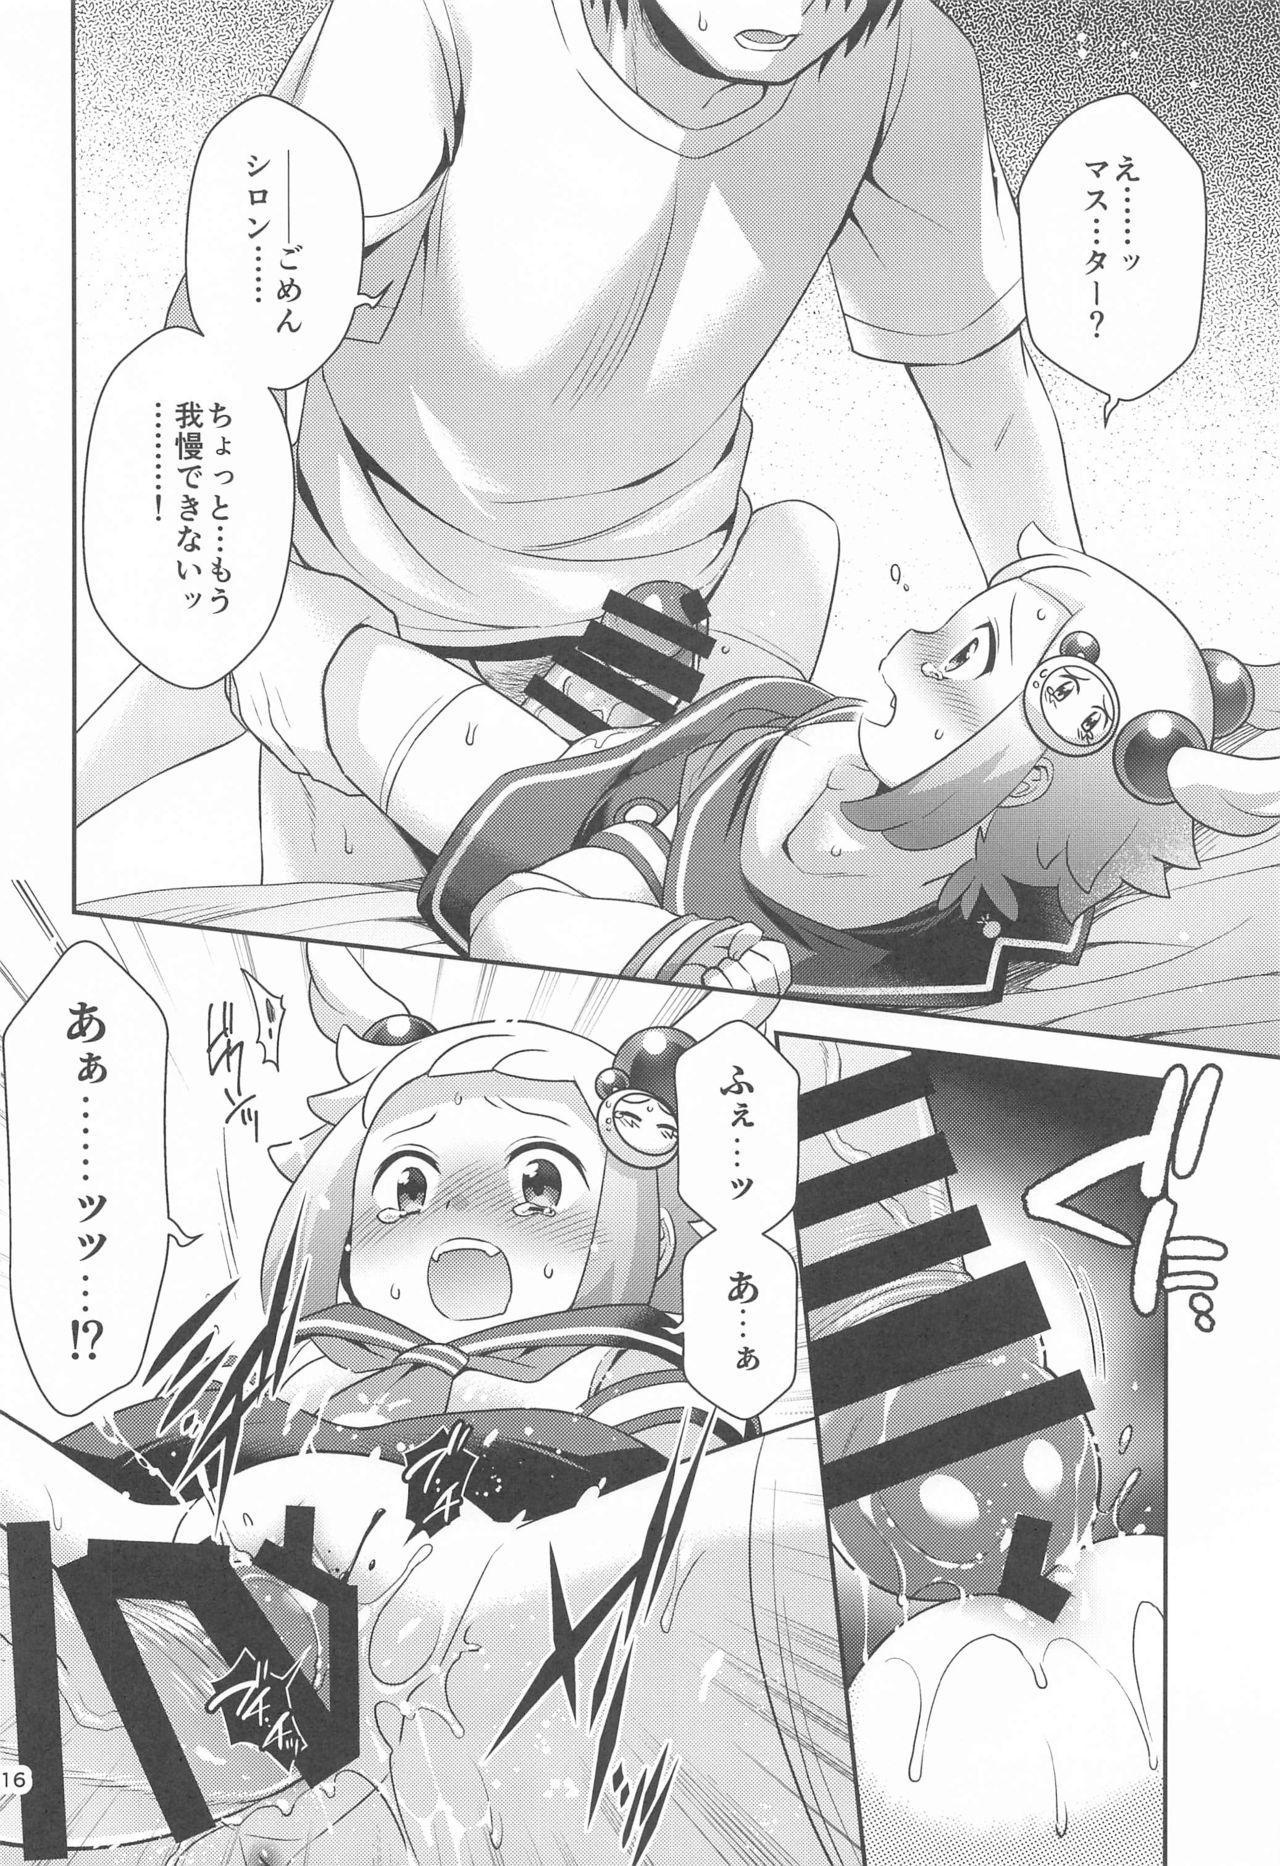 Shiron to LoveHo de Ecchi Suru 14